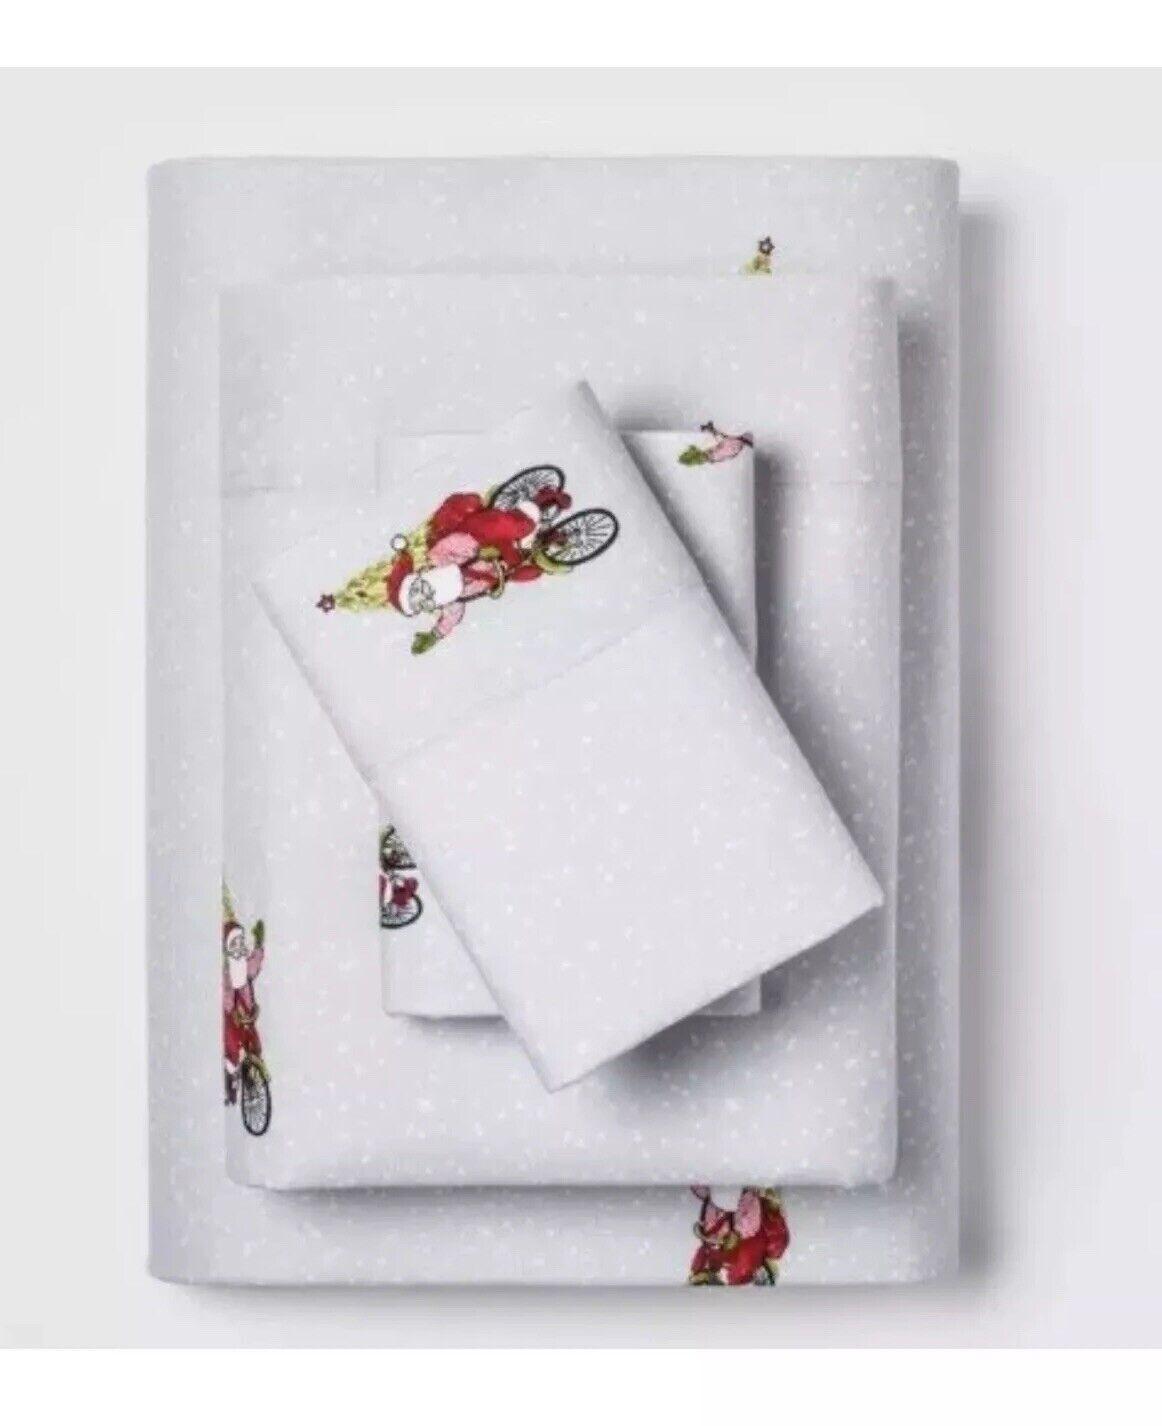 NEW QUEEN Threshold 100% Cotton Flannel Sheet Set Santa RIDING BIKE